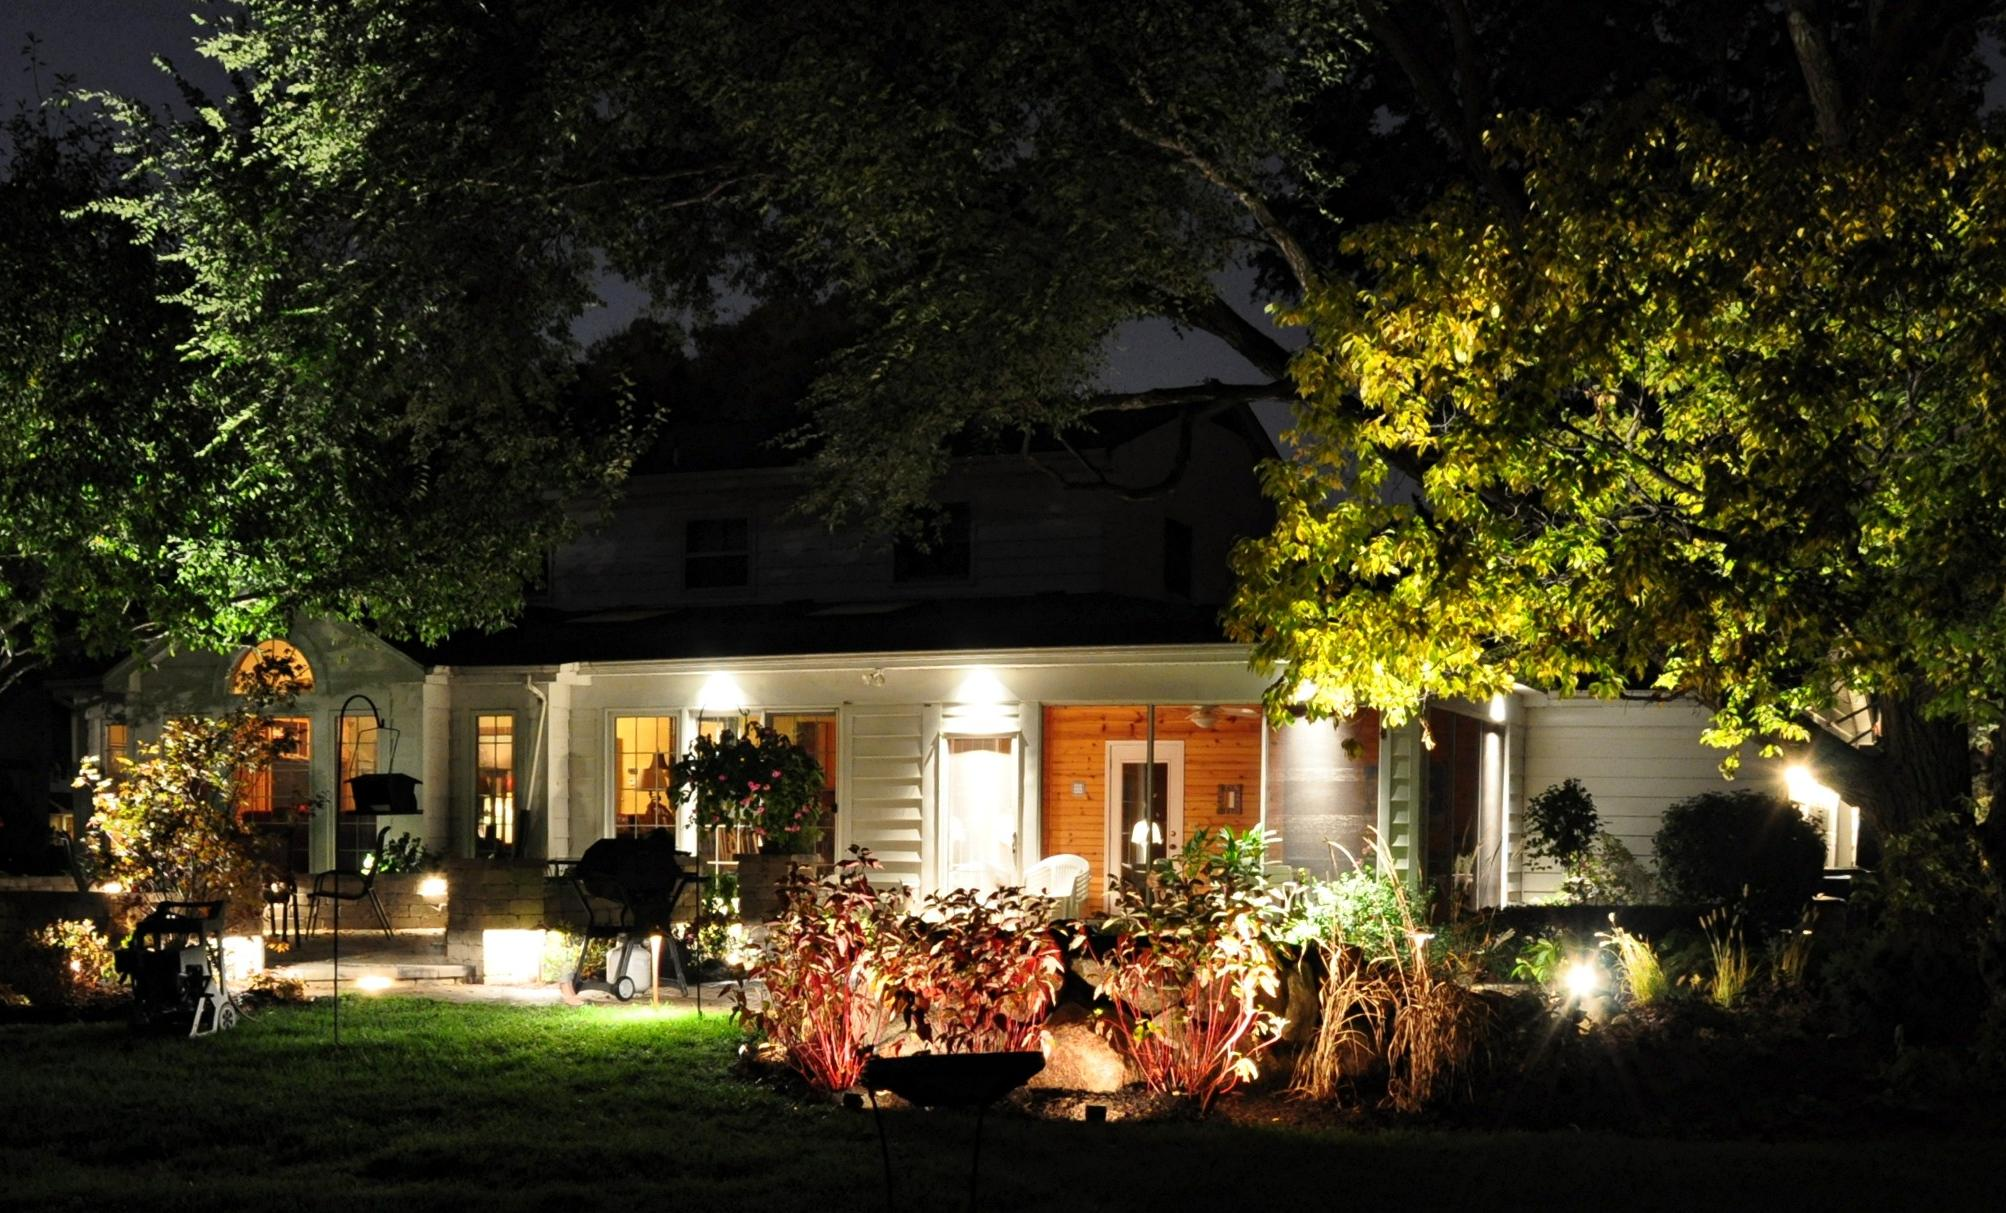 Lighting: Home High Spirits, Always!